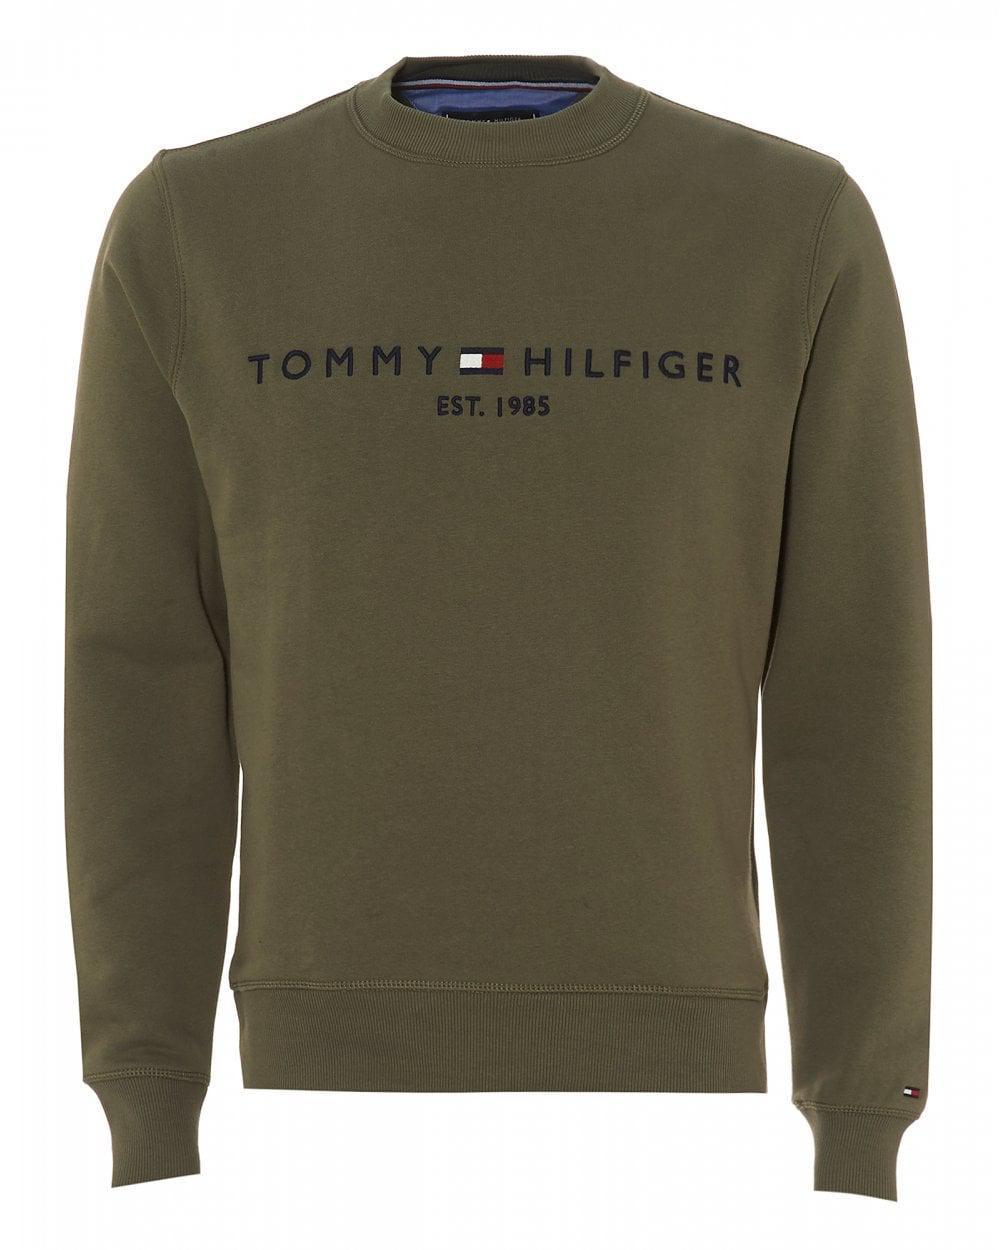 56eaf452168 ... 4668b8be Tommy Hilfiger Est. 1985 Logo Sweatshirt, Dusty Olive Sweat in  Green .